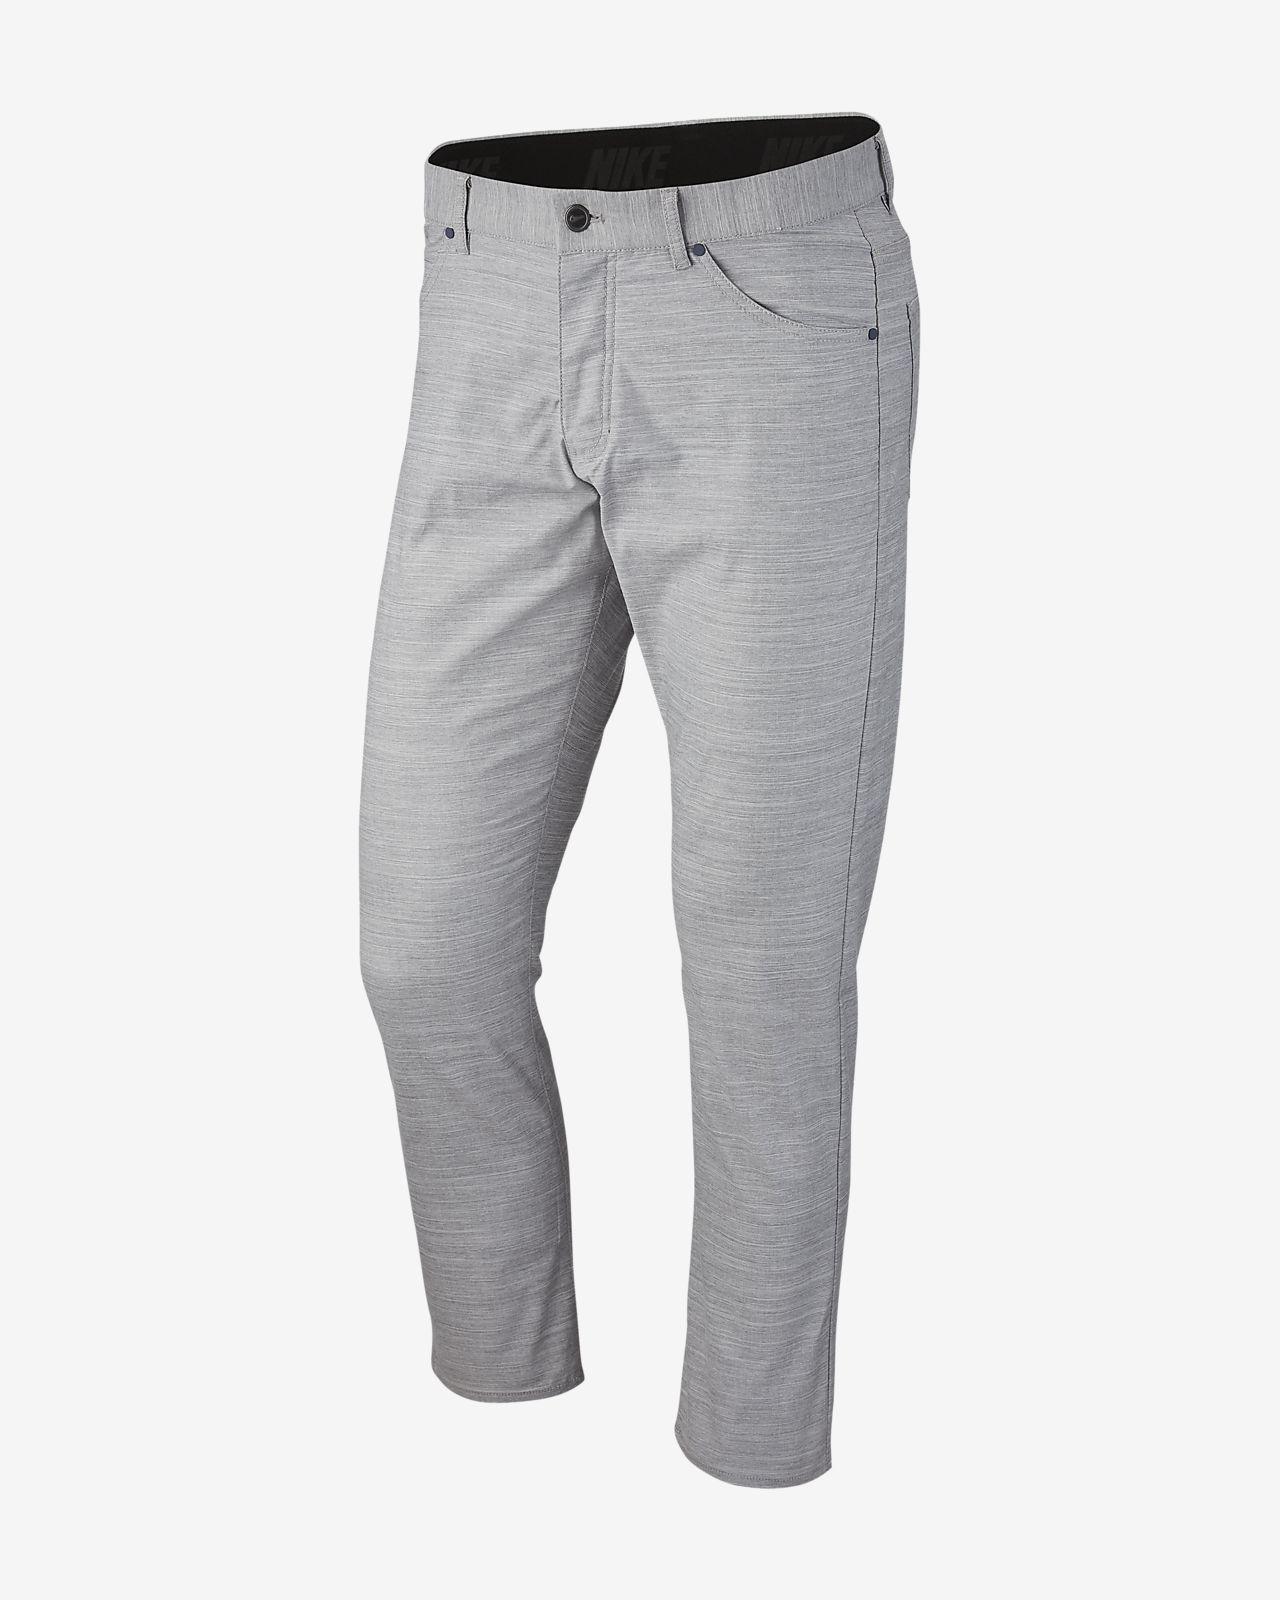 02be3eac0df4 Nike Flex Men s Slim-Fit 5-Pocket Golf Trousers. Nike.com CA